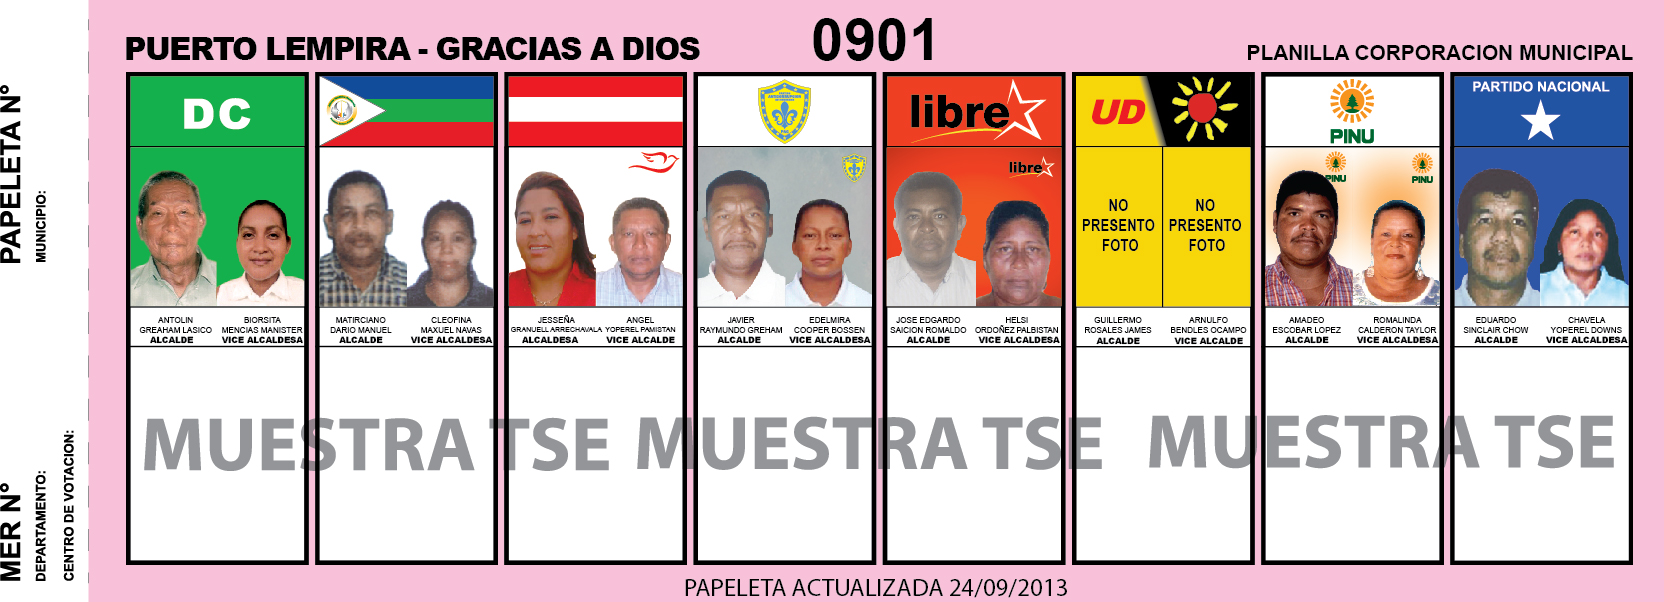 CANDIDATOS 2013 MUNICIPIO PUERTO LEMPIRA - GRACIAS A DIOS - HONDURAS